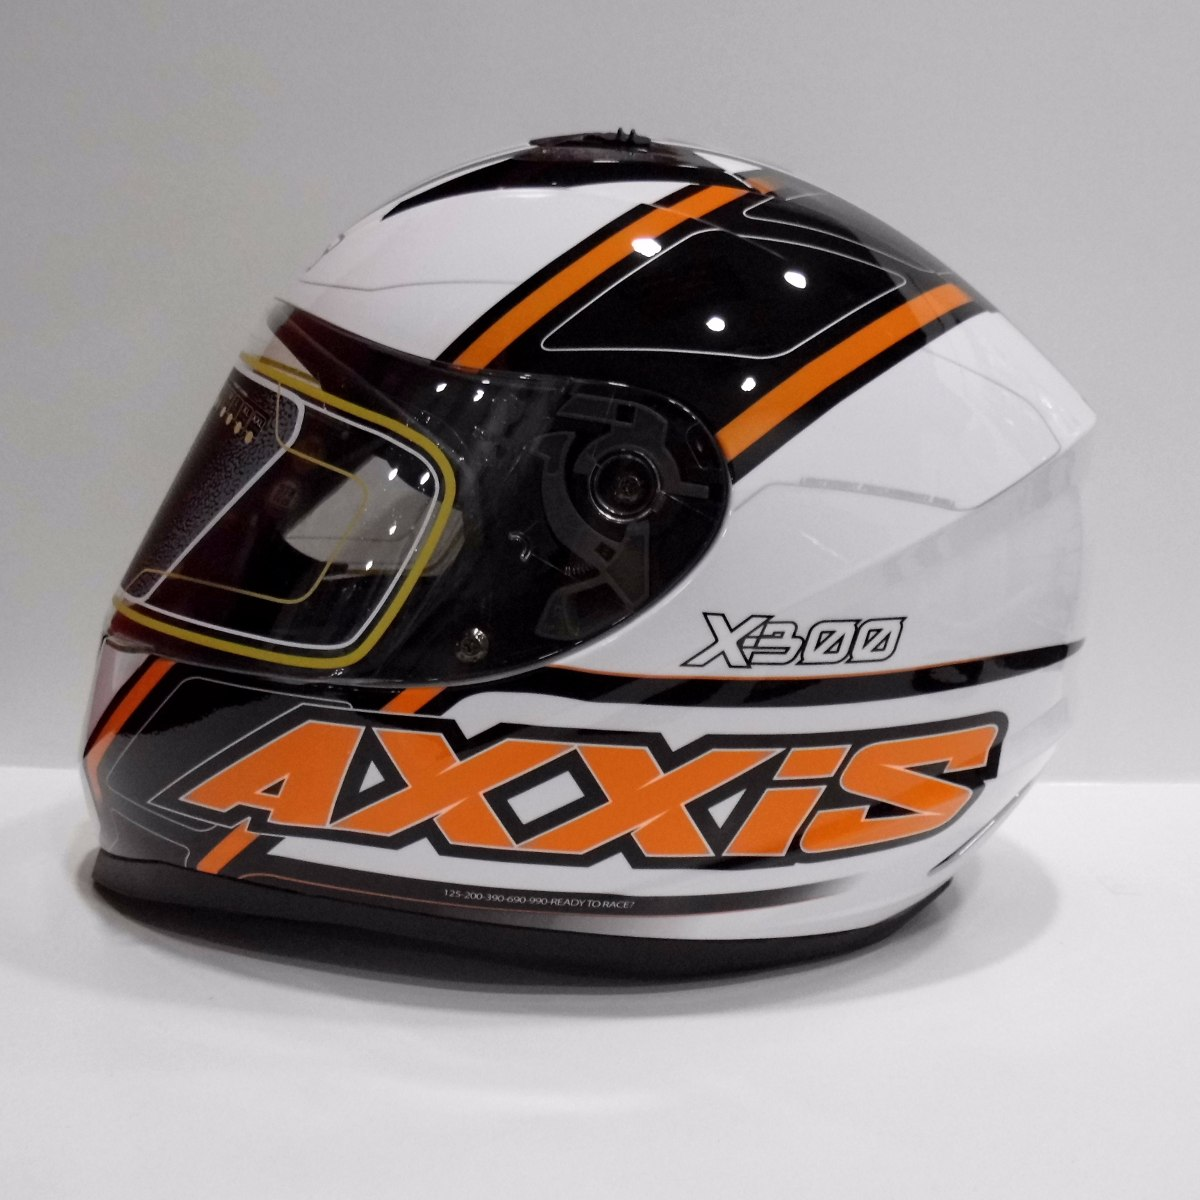 d10e857aaed9d Casco Moto Axxis X-300 Duke Blanco Integral Deportivo. -   62.900 en ...